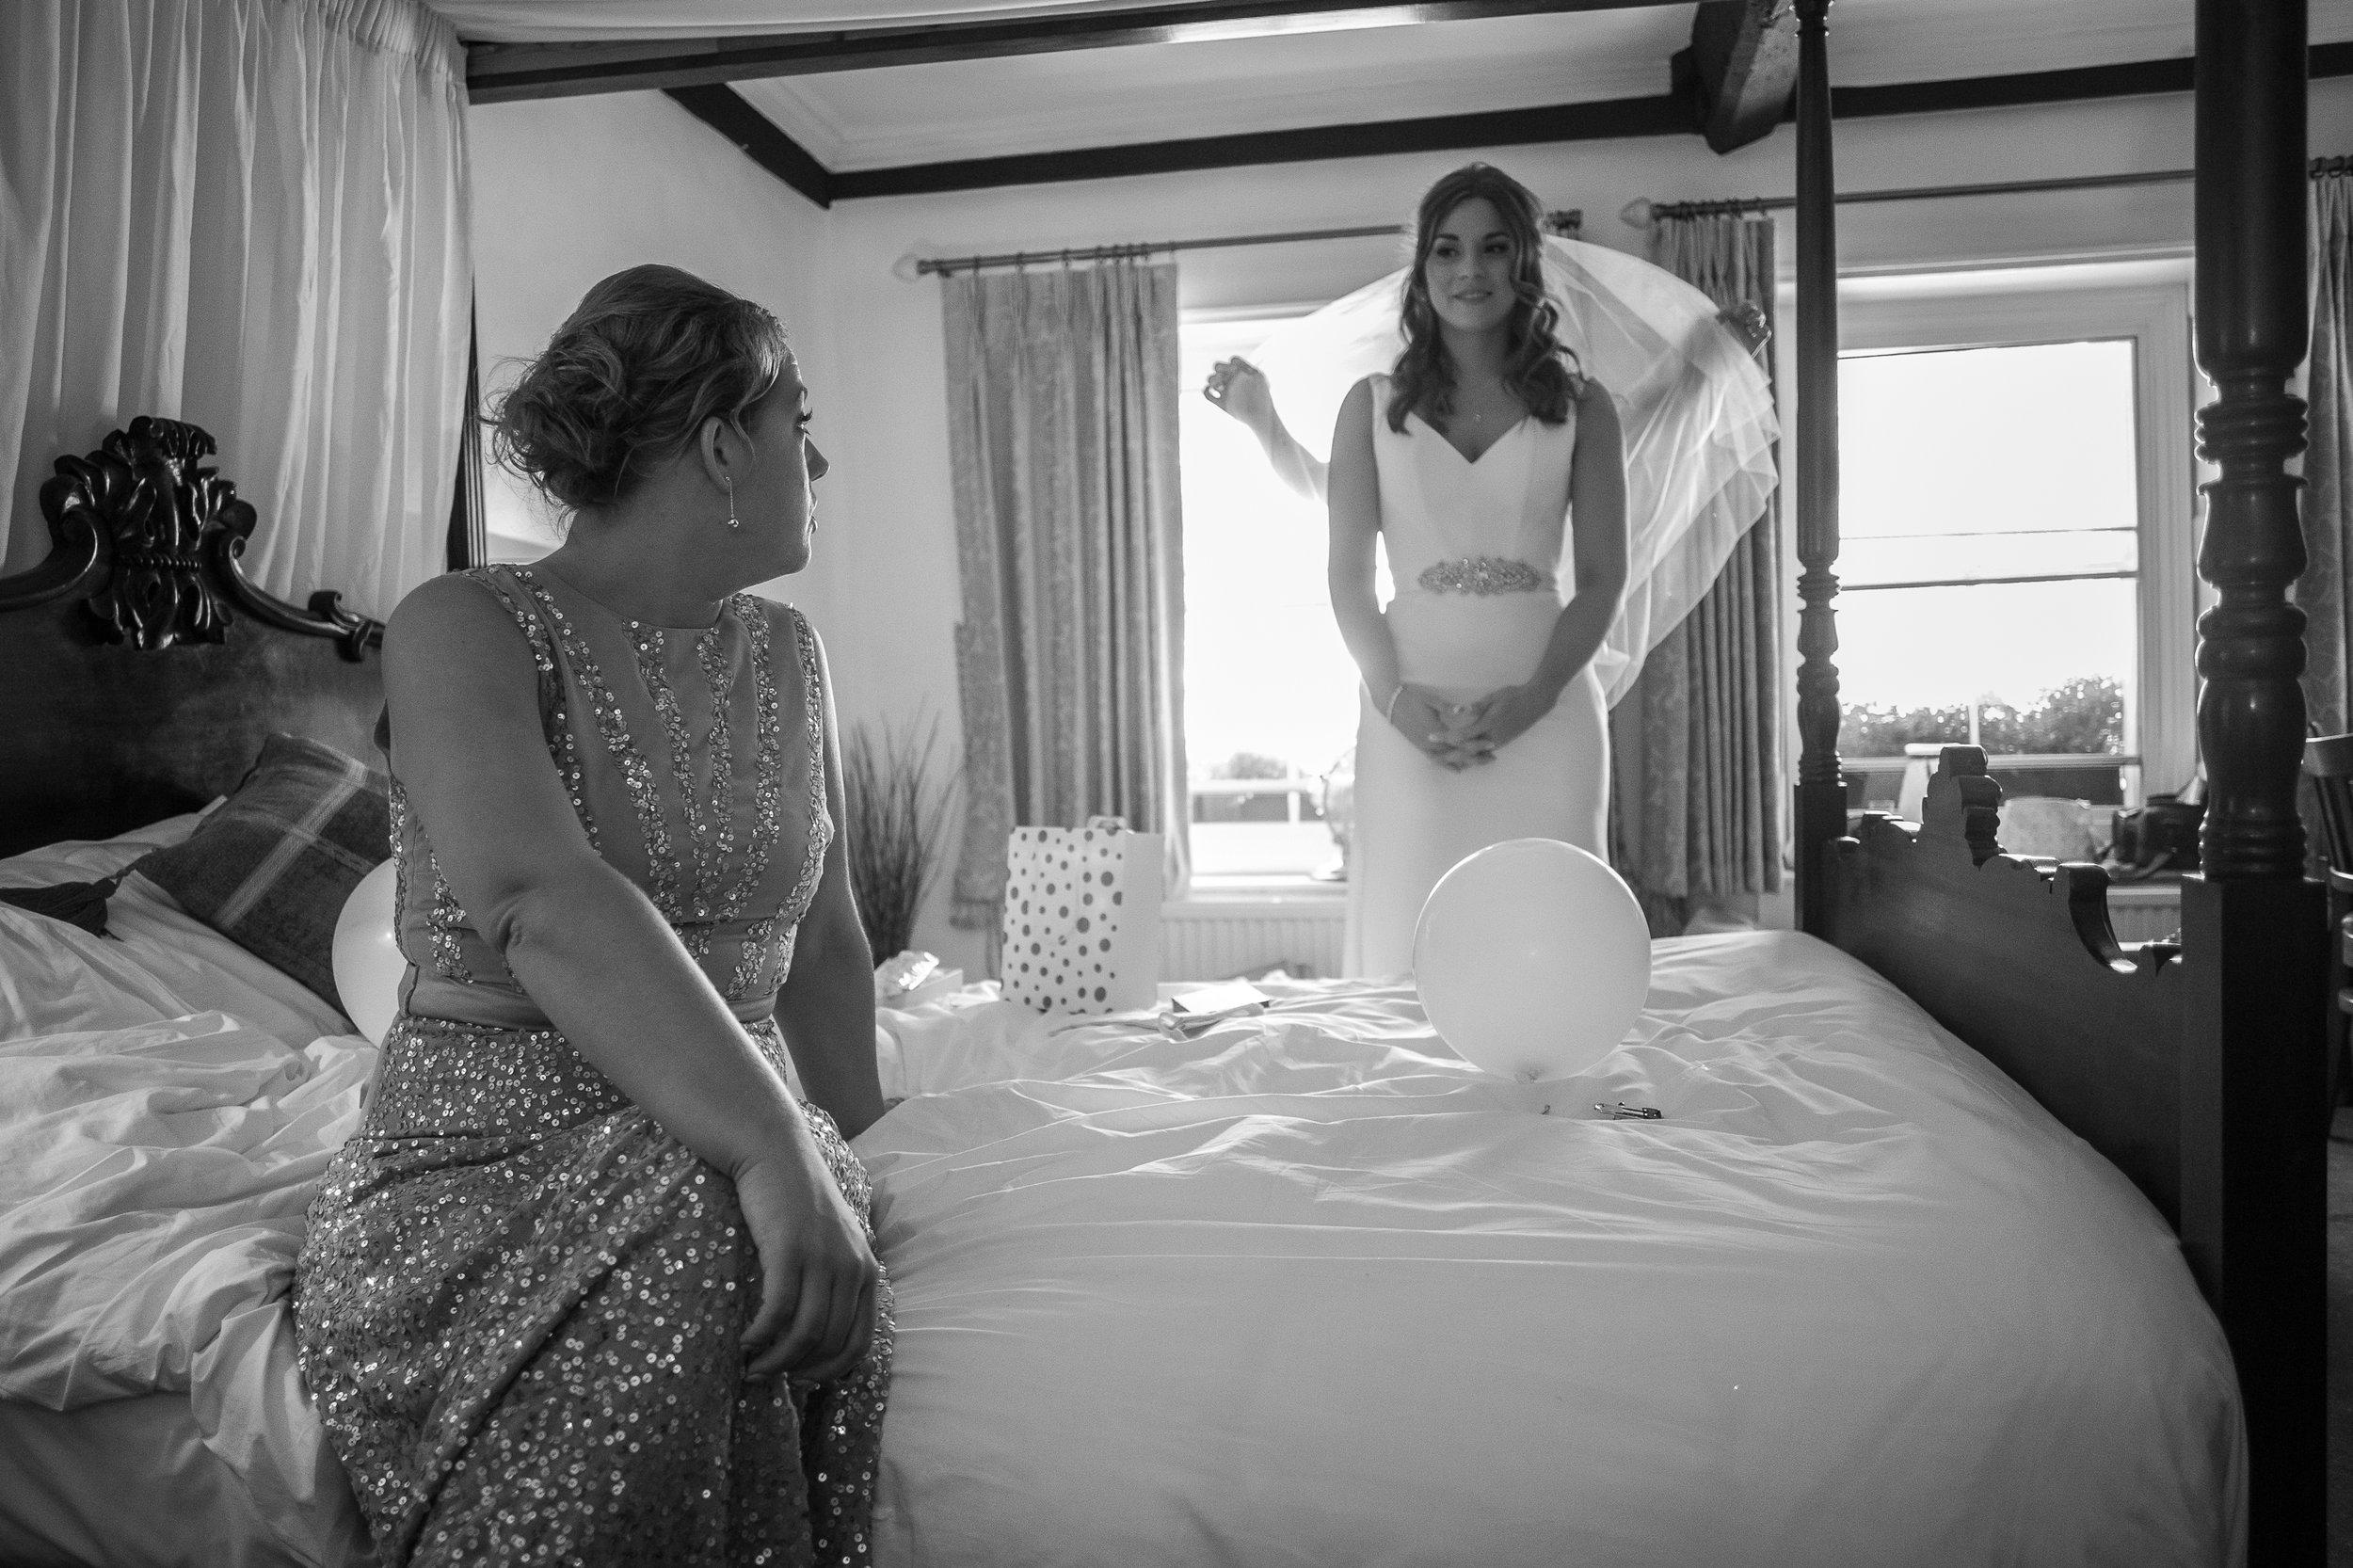 Grittenham Barn female wedding photographers west sussex petworth social-26.jpg